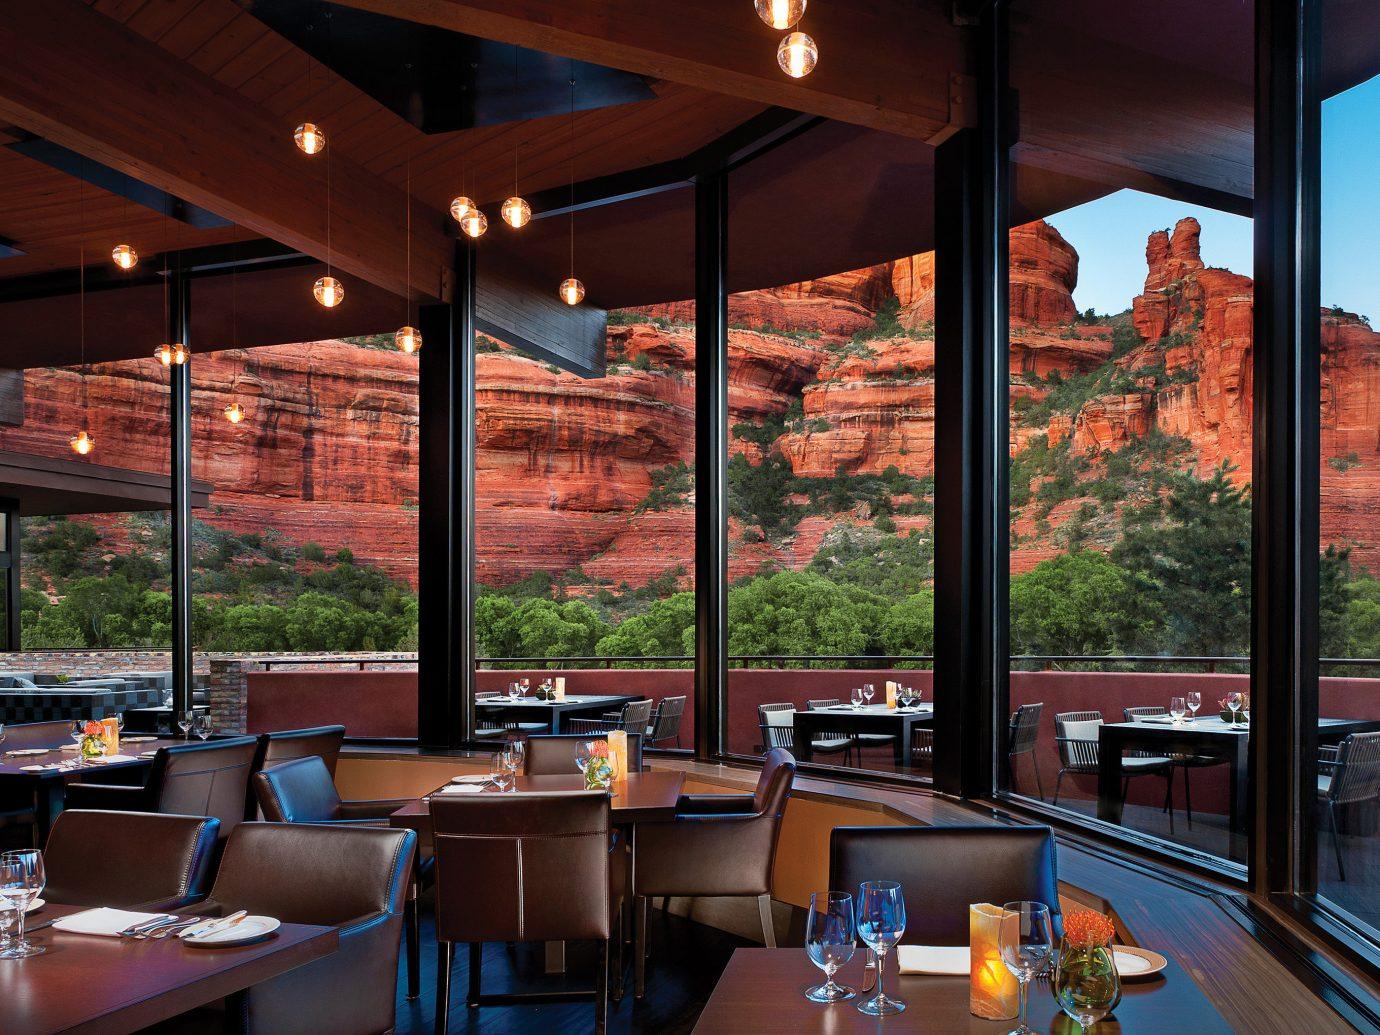 Hotels Jetsetter Guides Luxury Travel Trip Ideas Weekend Getaways table restaurant Resort interior design estate Bar Design overlooking area